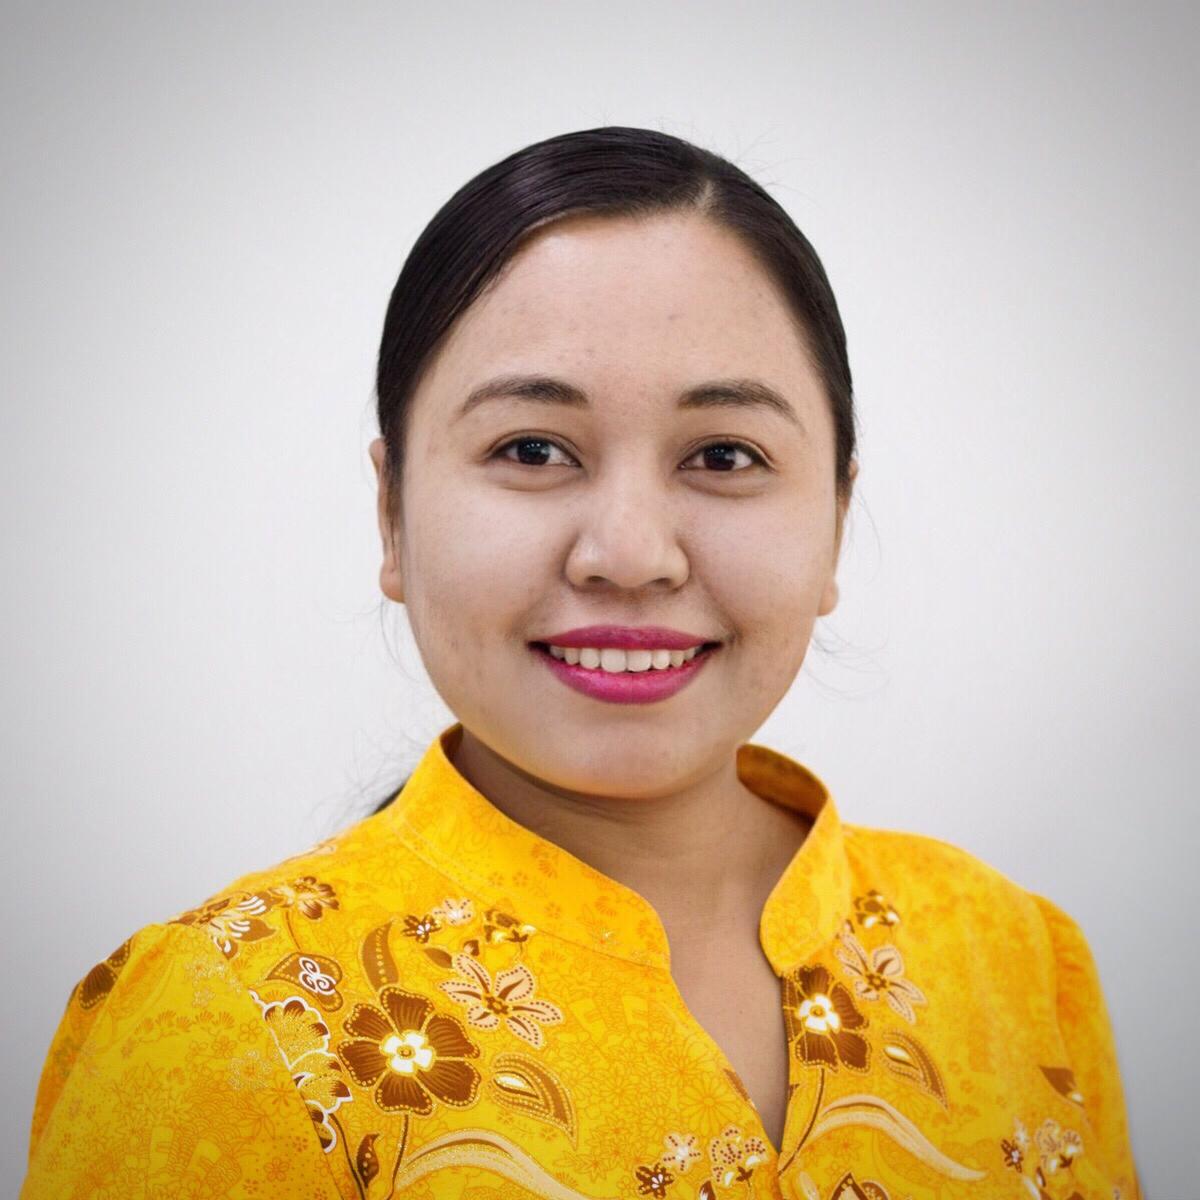 Ms. Panchalika Deachamag